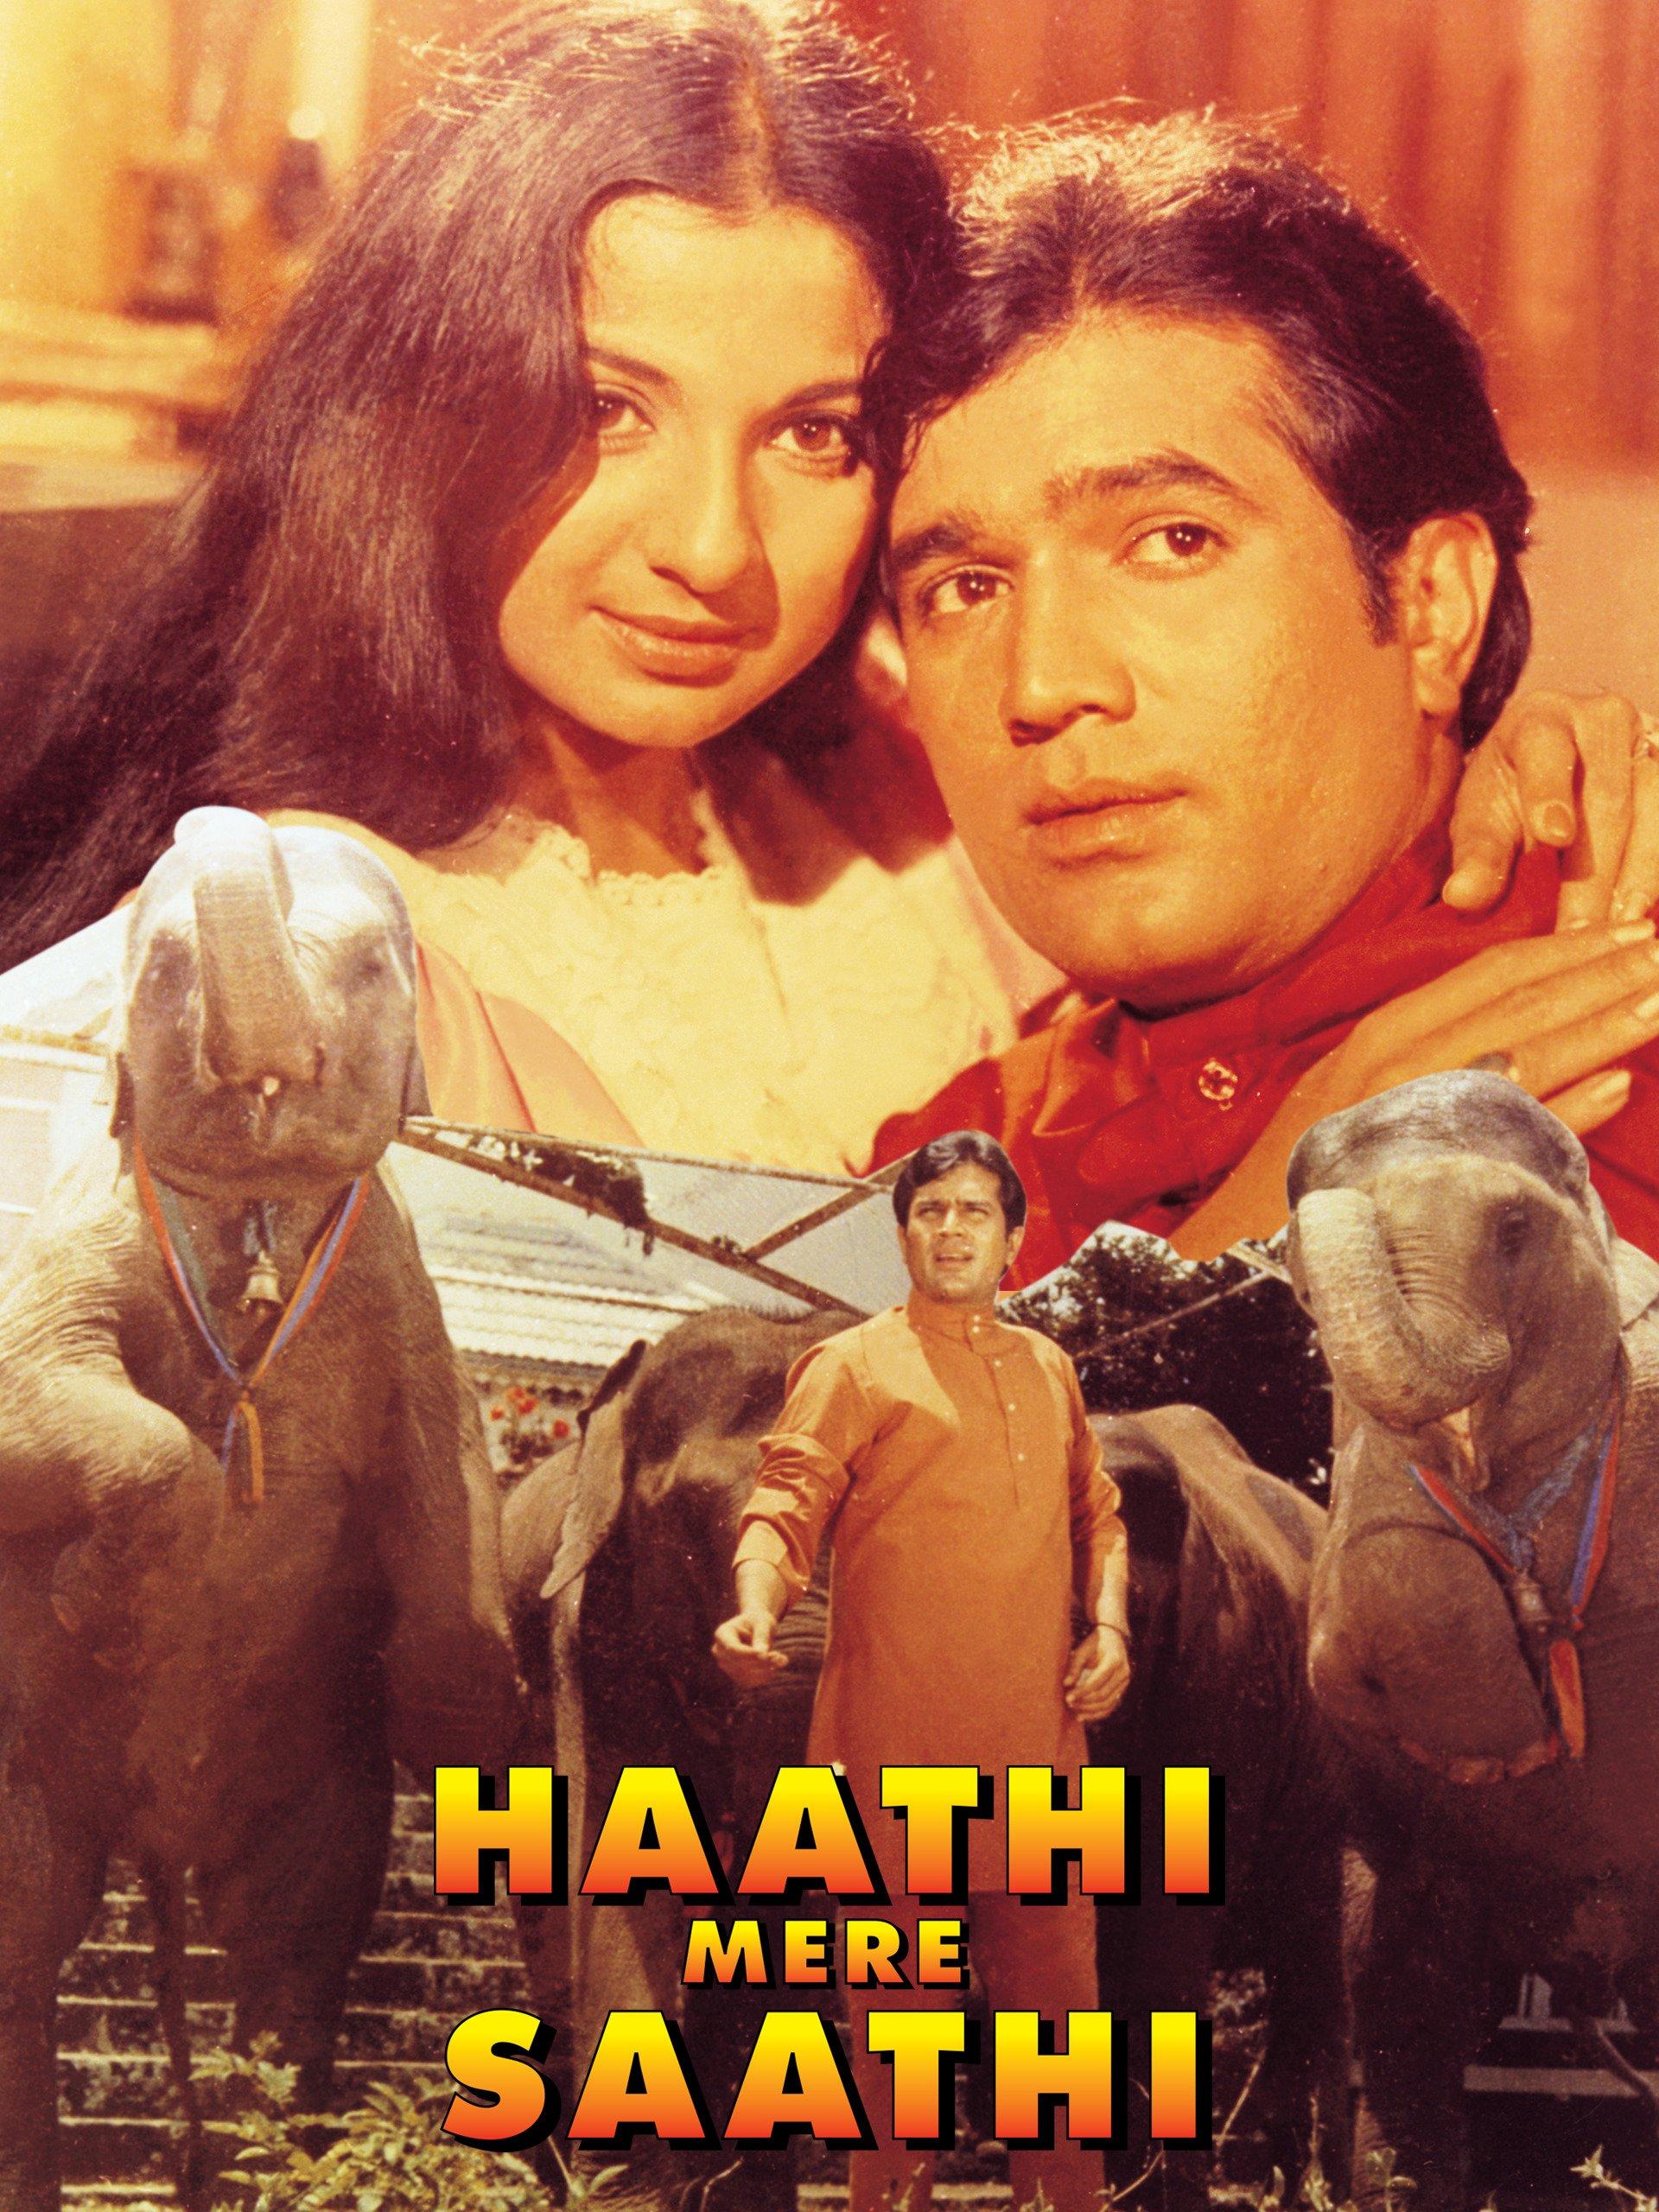 Amazon.com: Haathi Mere Saathi: Abhi Bhattacharya, K N Singh, Madan Puri,  Rajesh Khanna